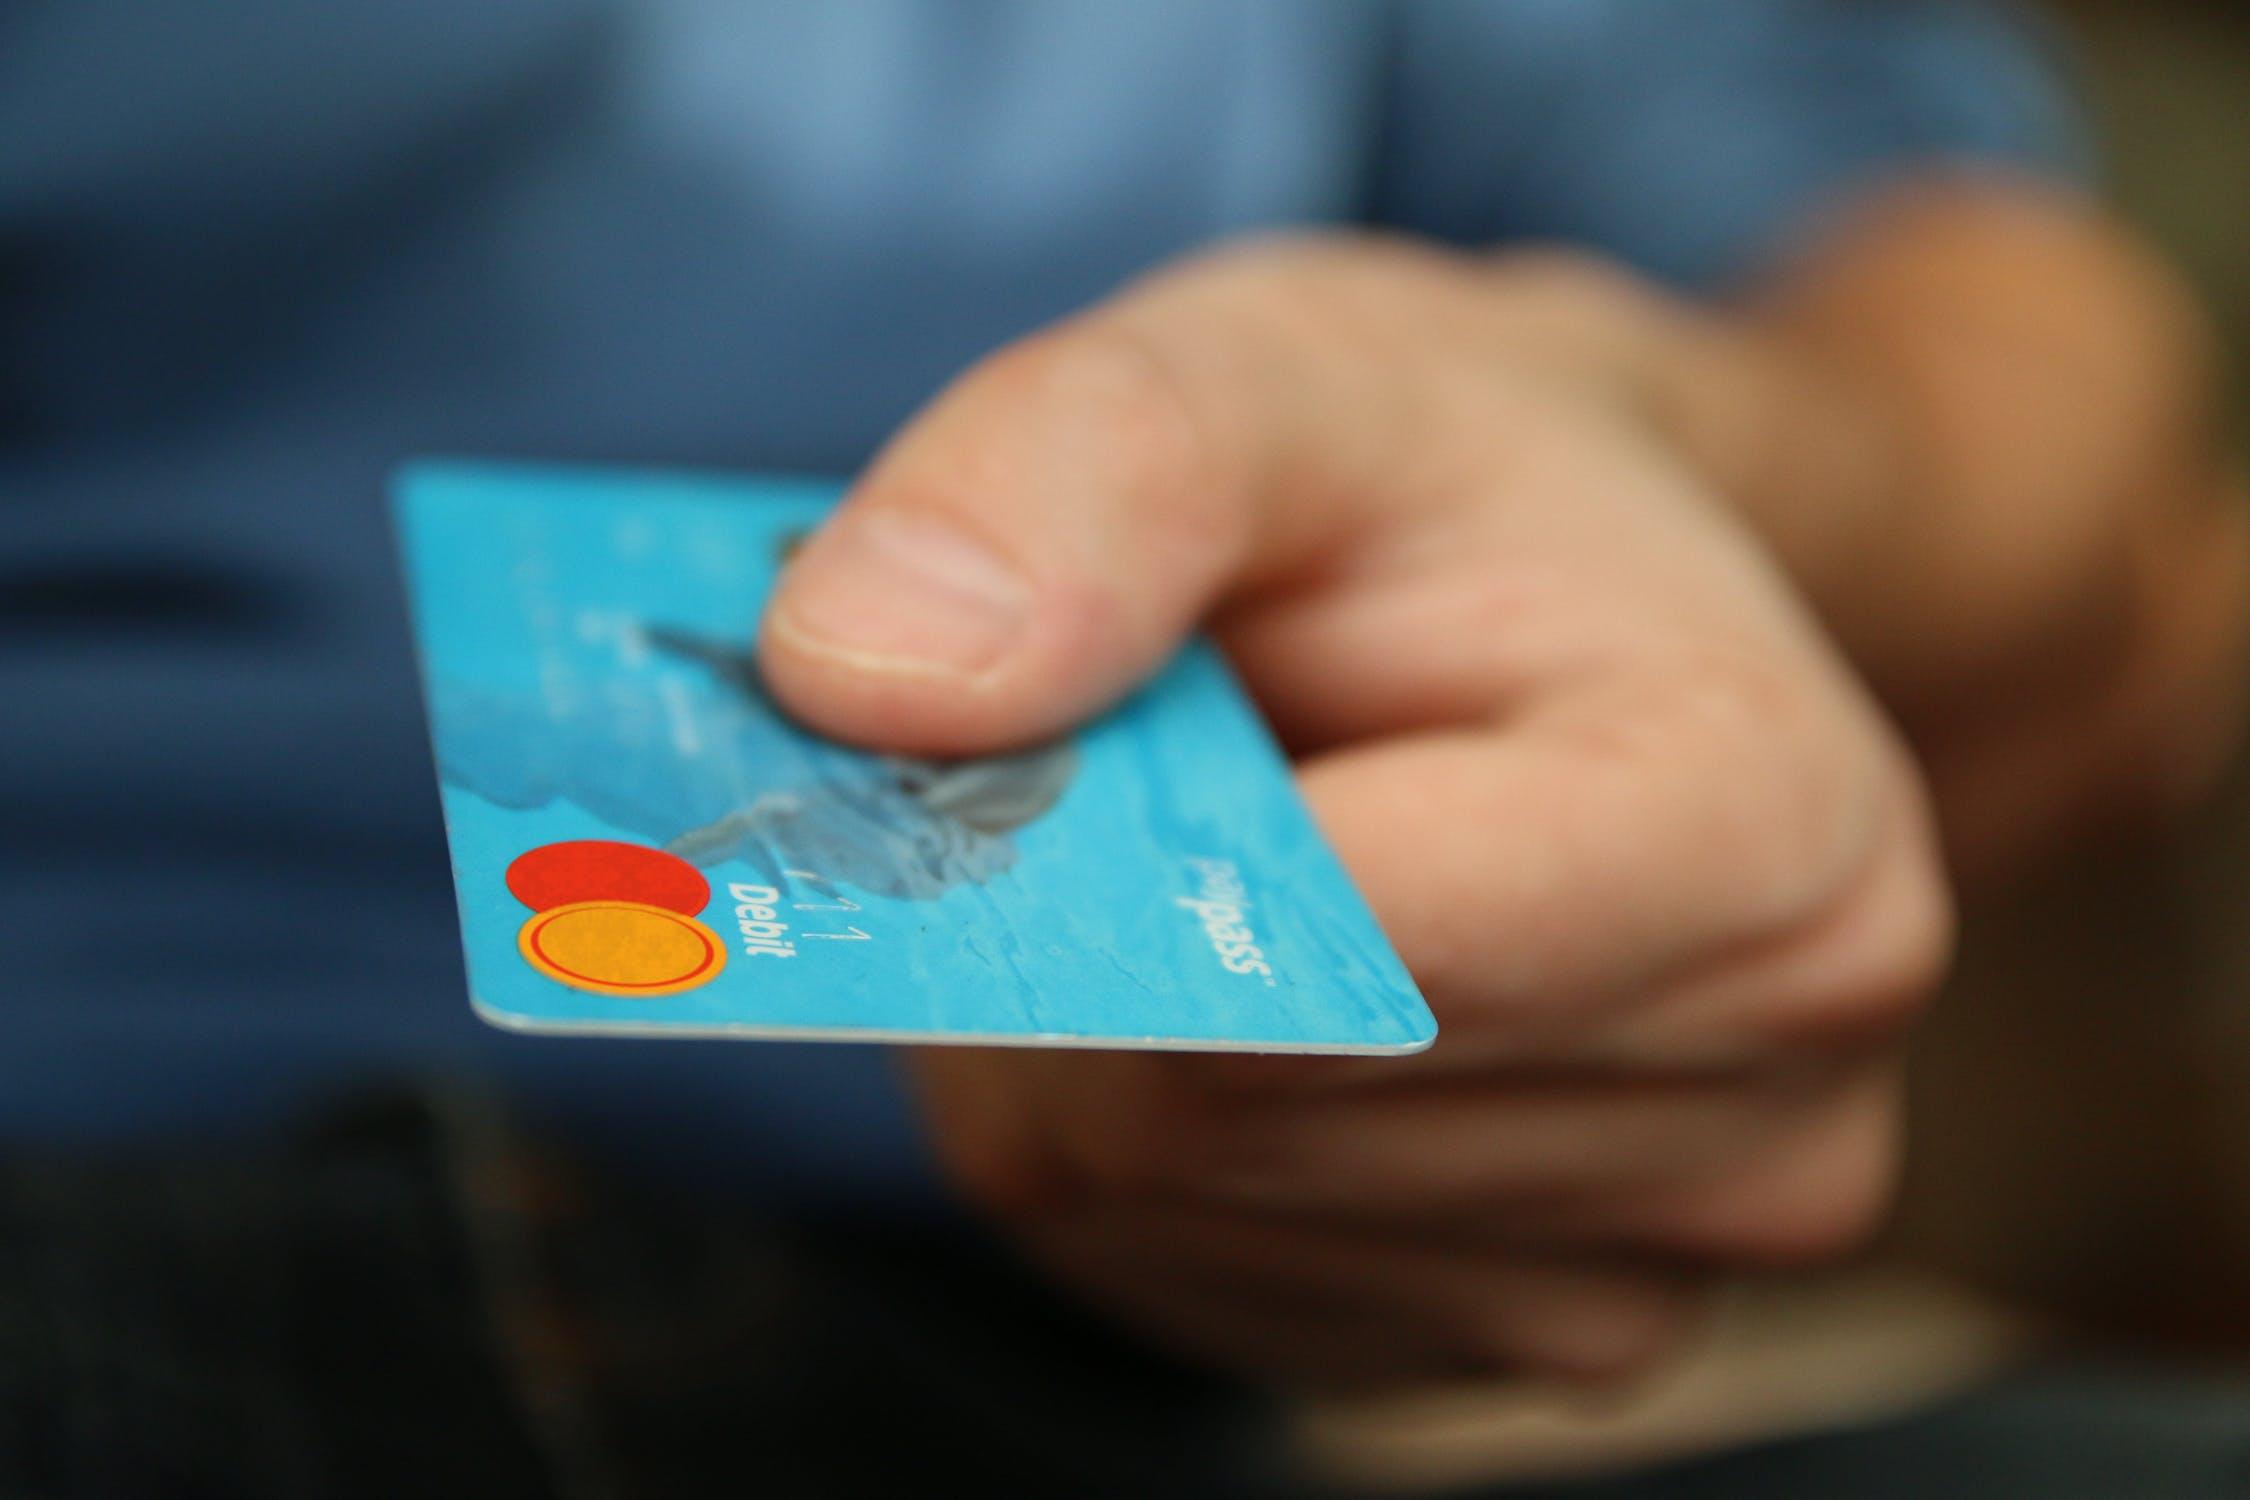 Clearing Debt: 3 Often Overlooked Solutions